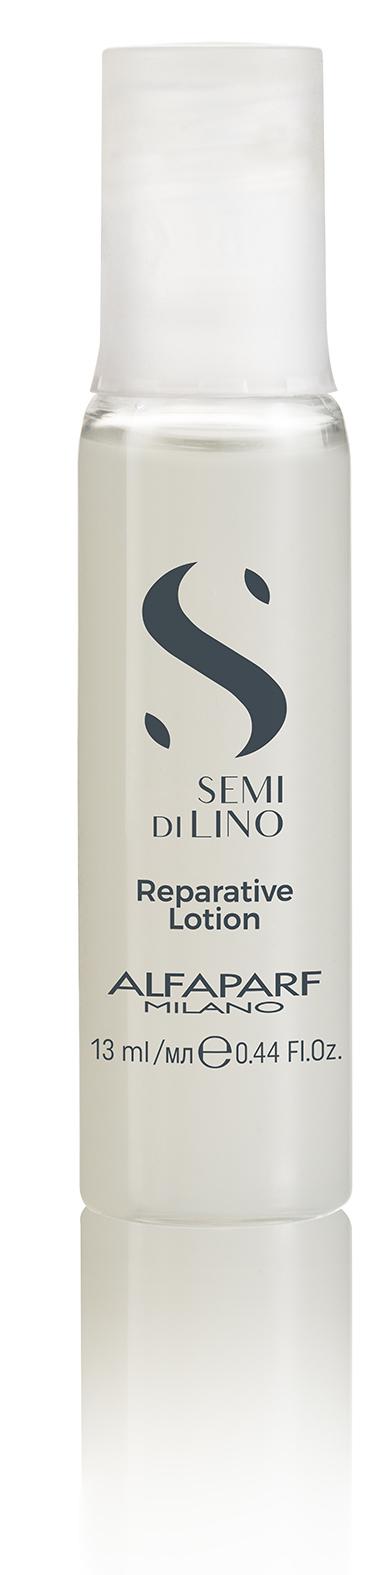 New Лосьон, восстанавливающий структуру волос SDL RECONSTRUCTION REPARATIVE LOTION 6 АМПУЛ ПО 13 МЛ ALFAPARF 16414